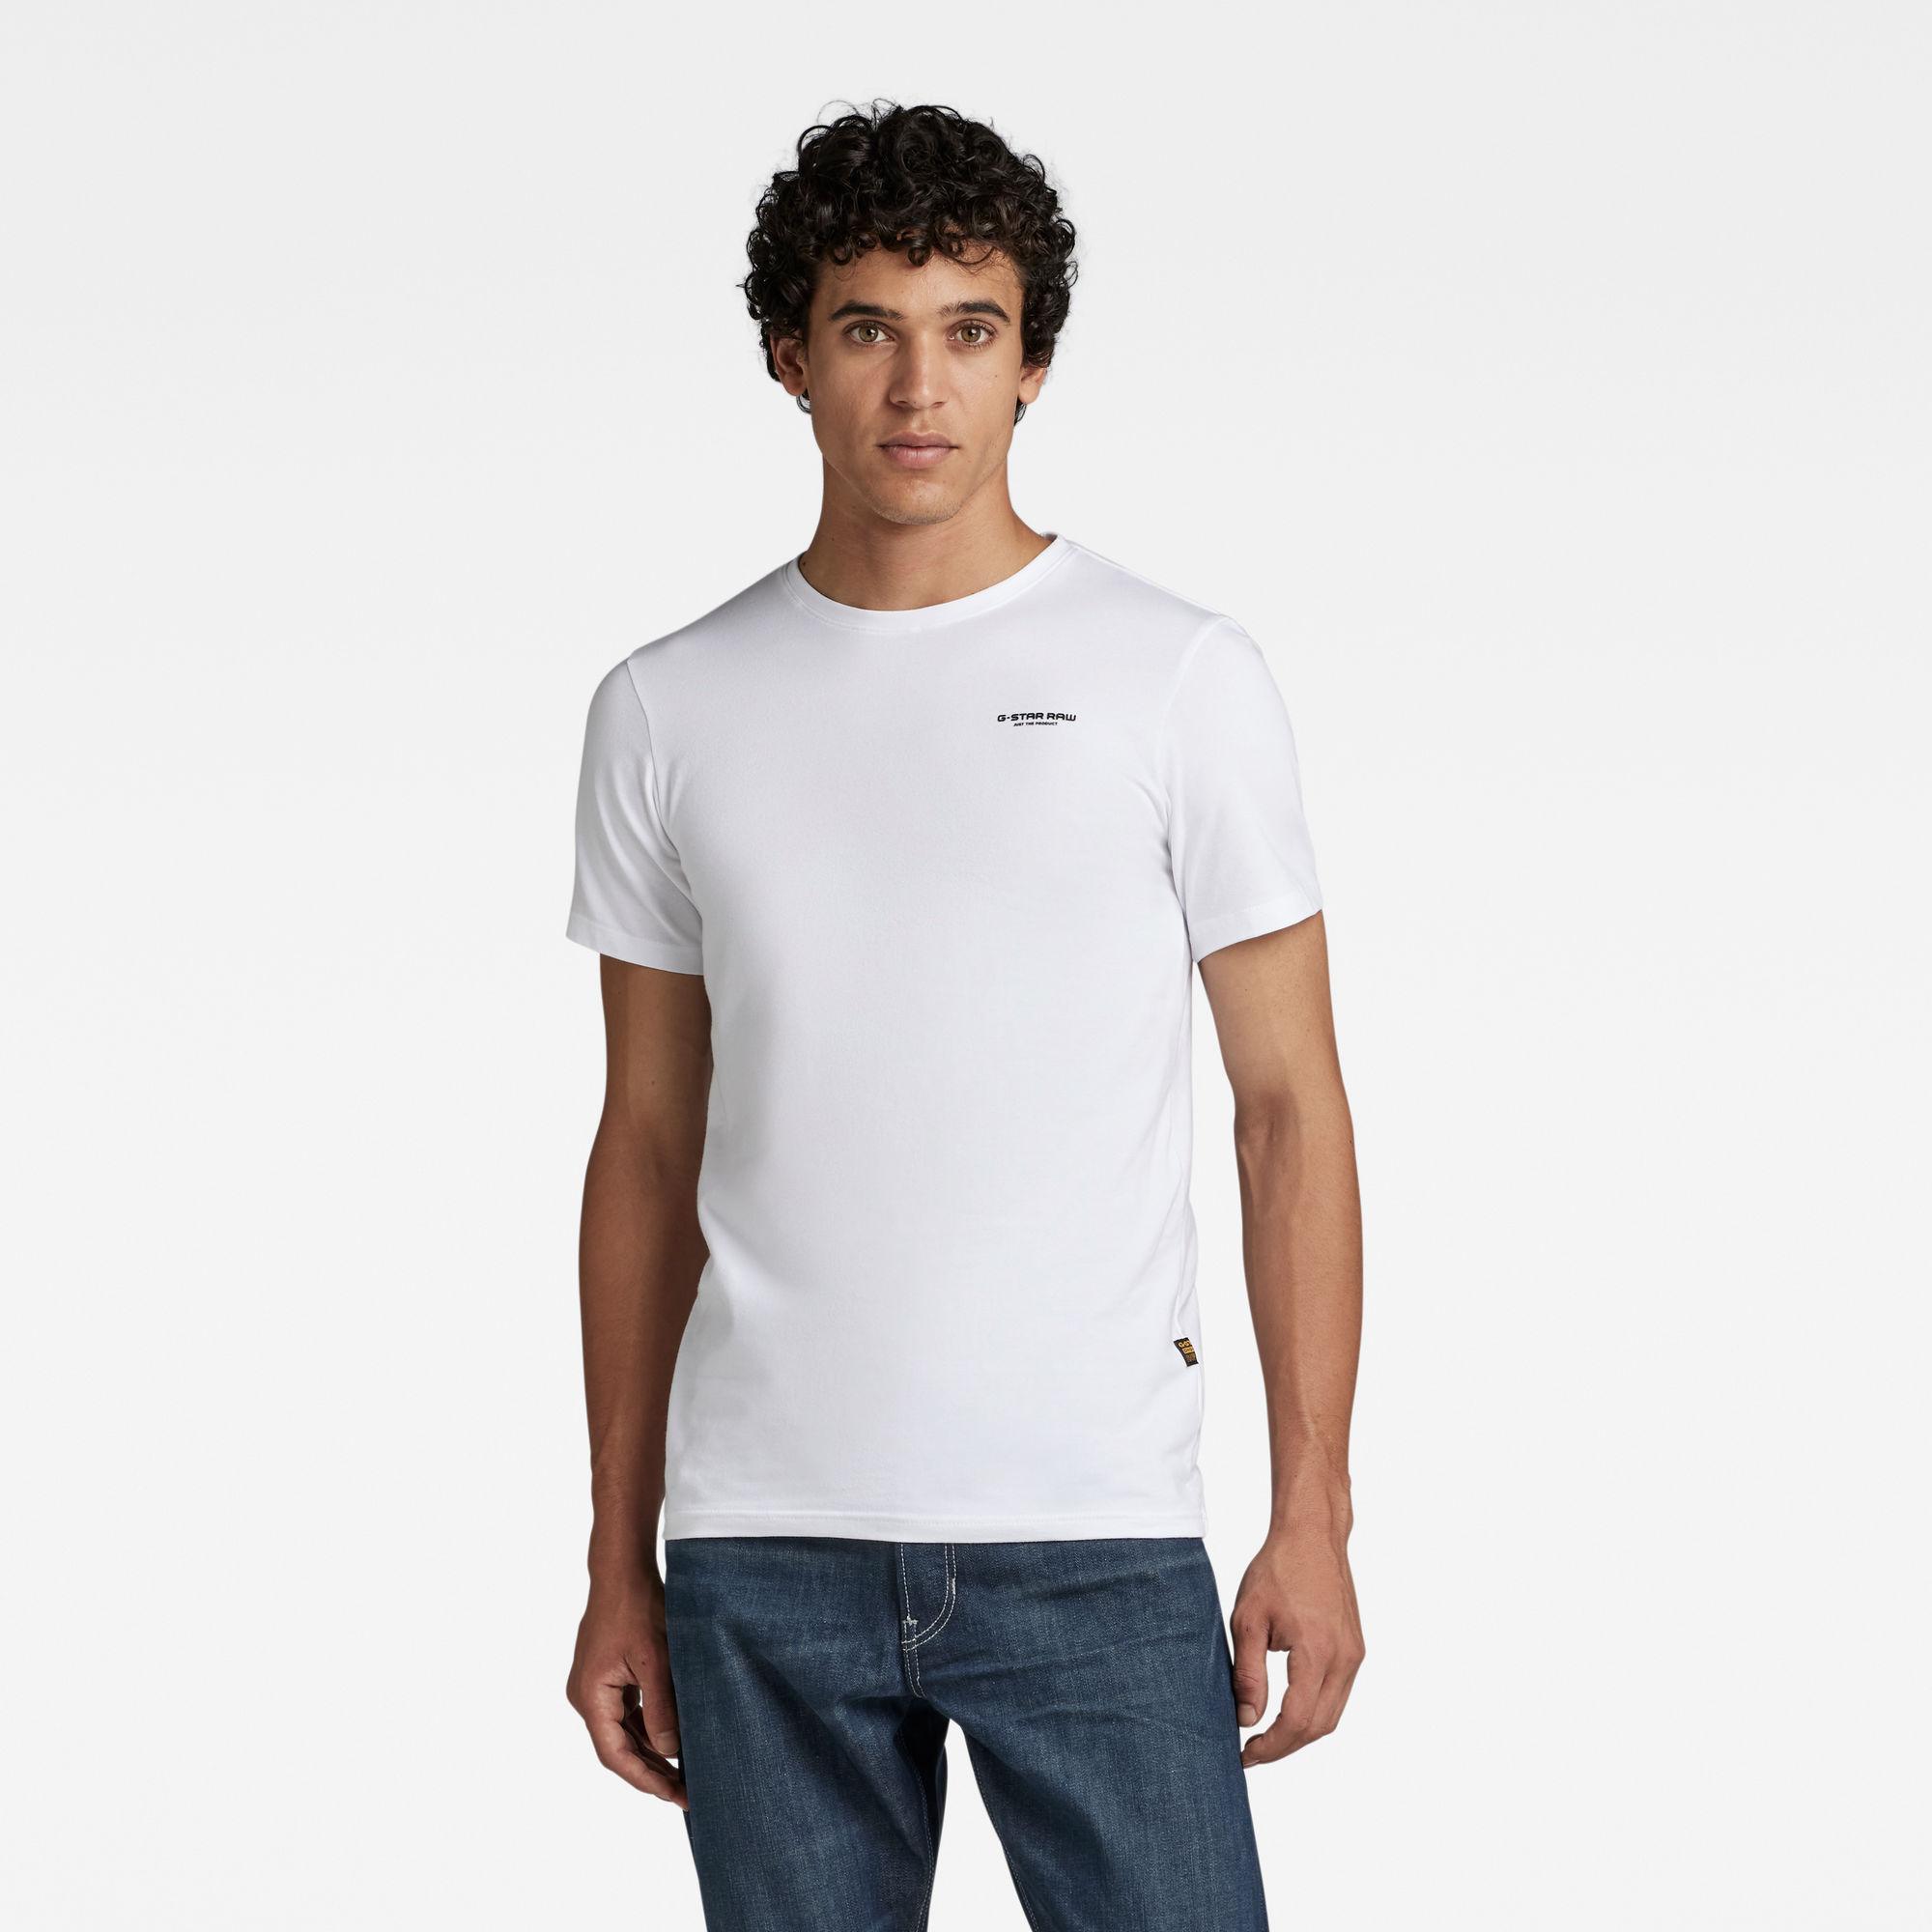 G-Star RAW Heren Slim Base T-Shirt Wit